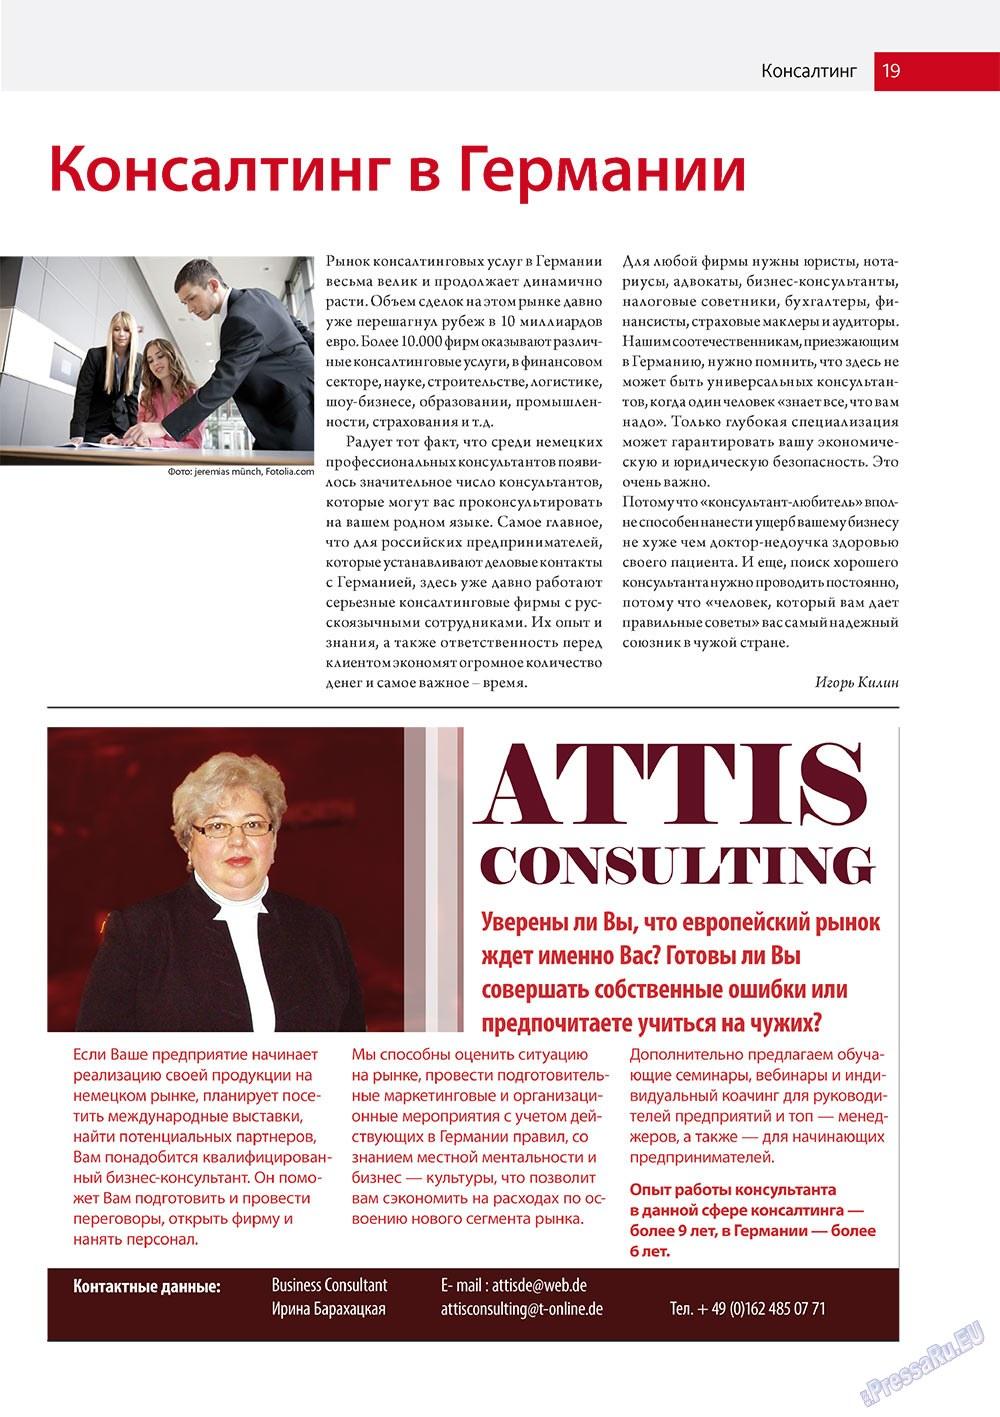 Бизнес парк (журнал). 2011 год, номер 4, стр. 19